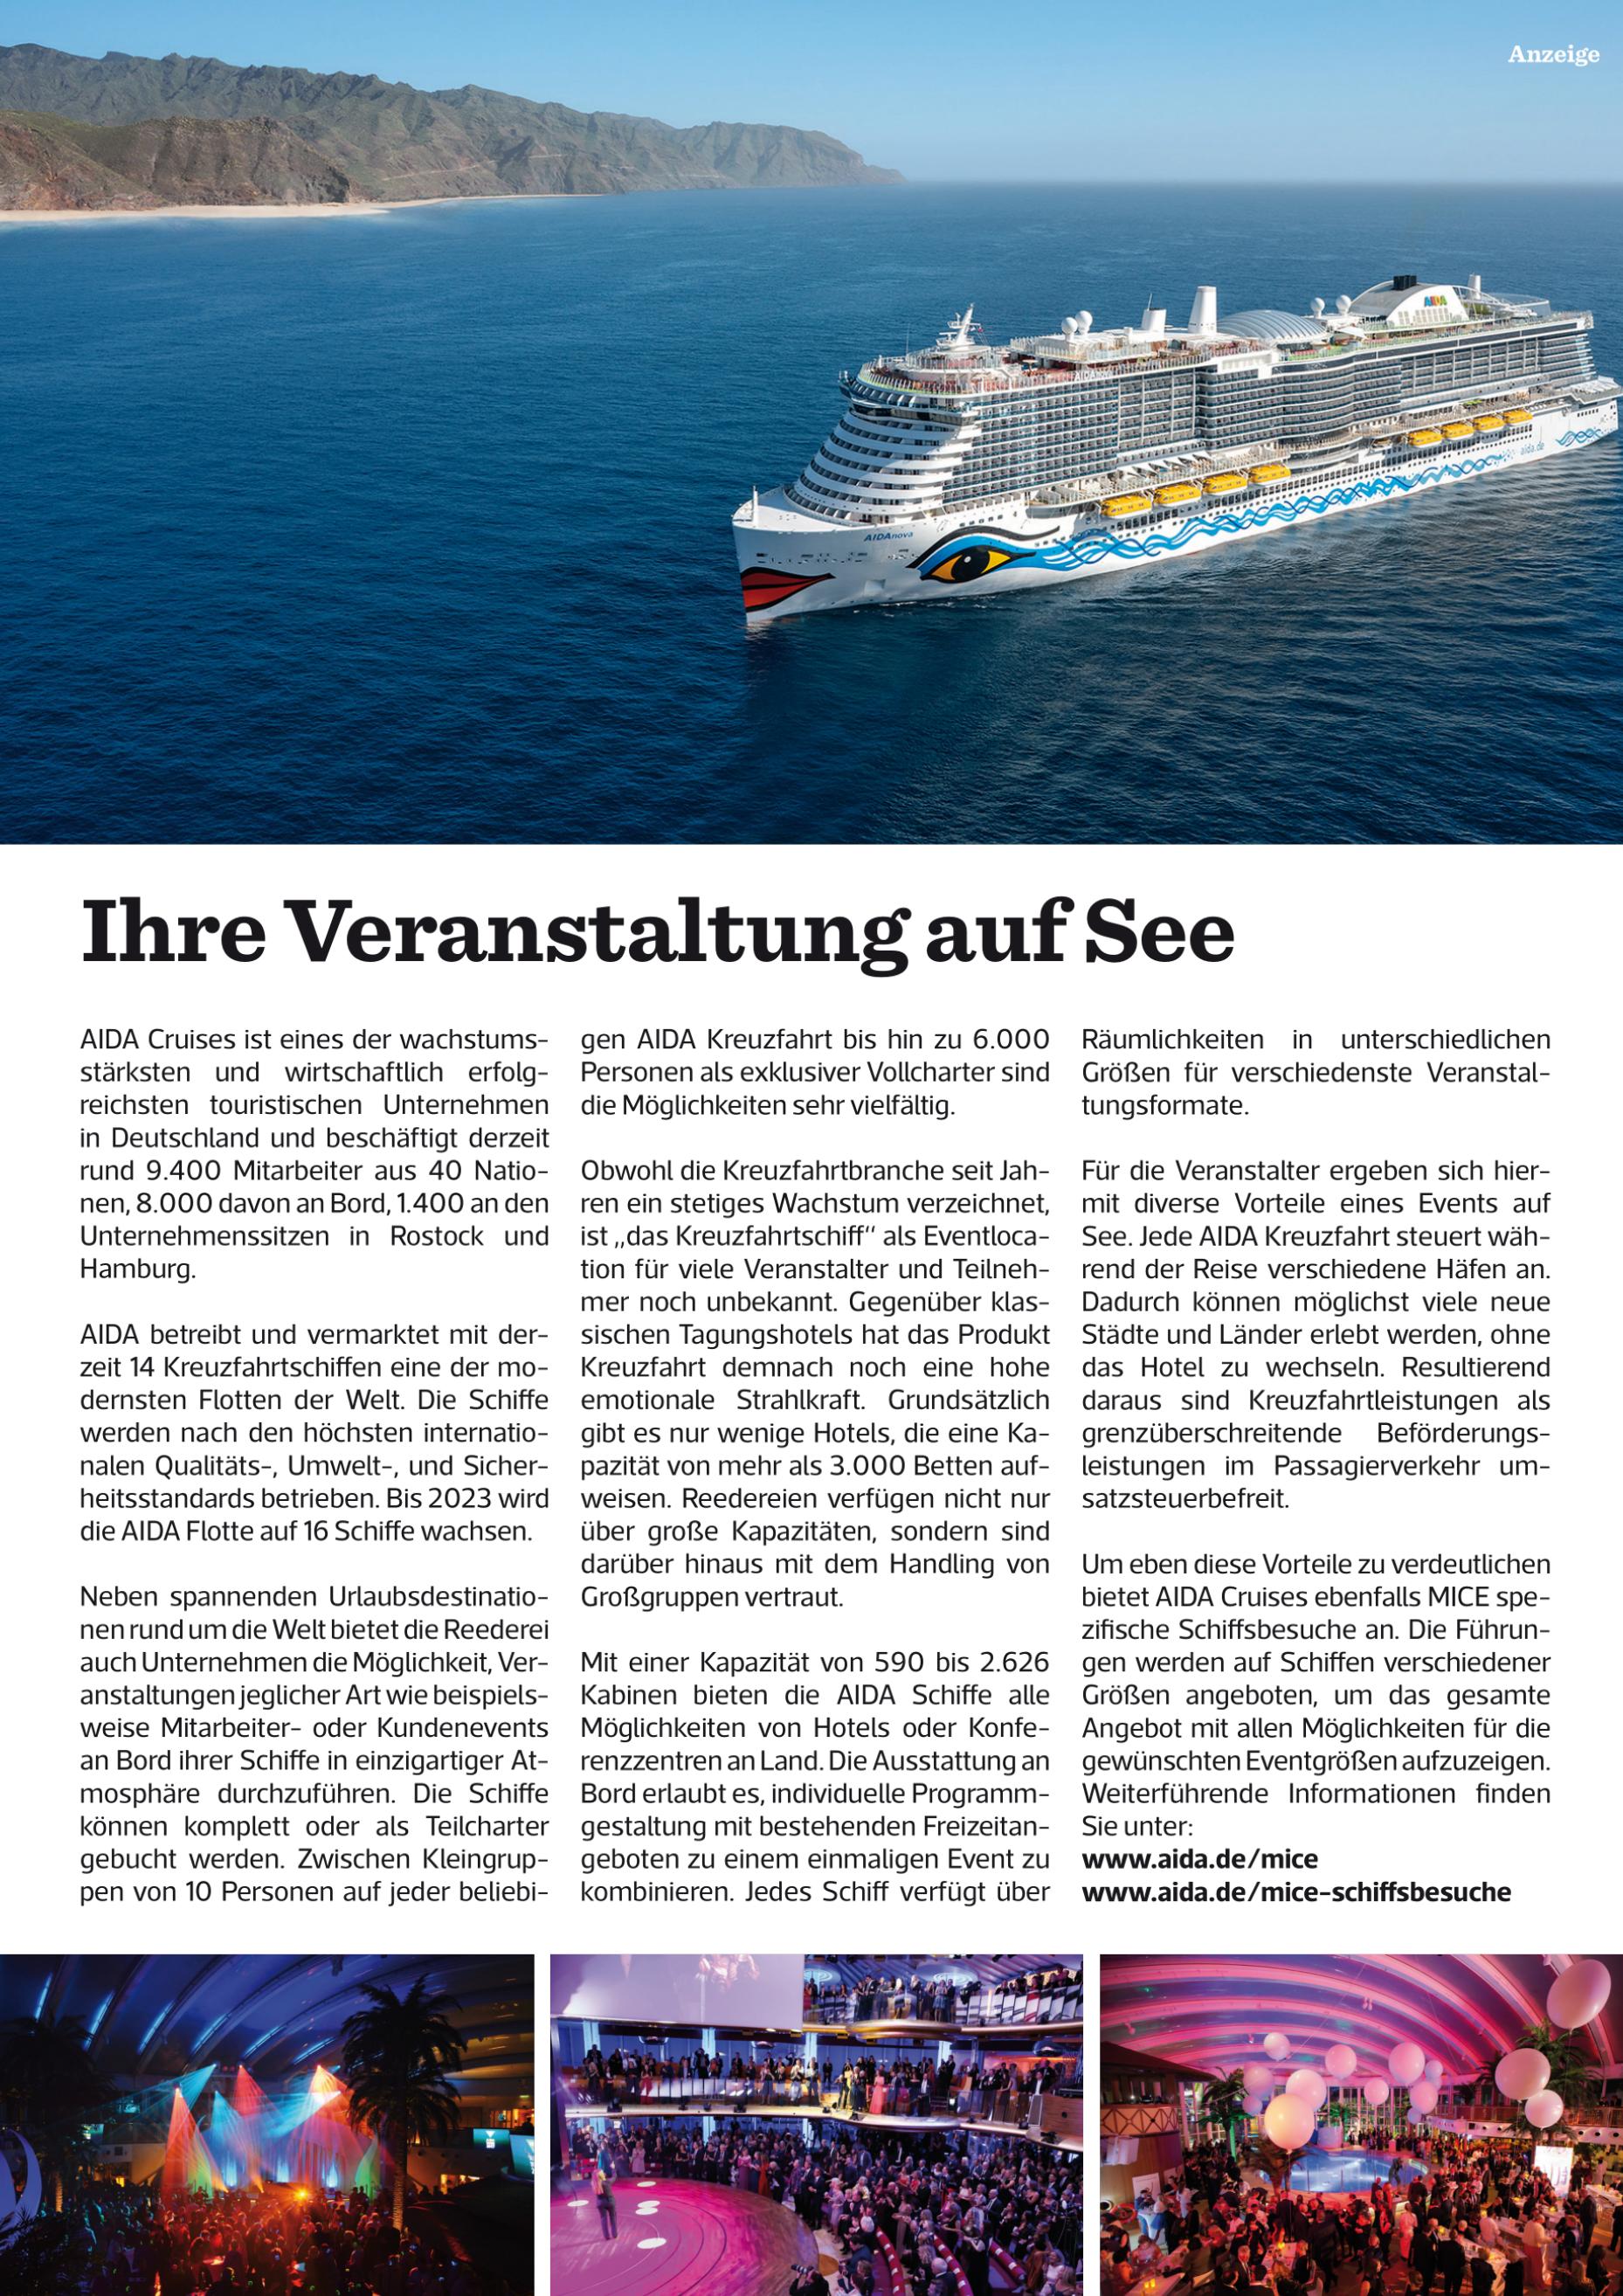 AIDA Cruises